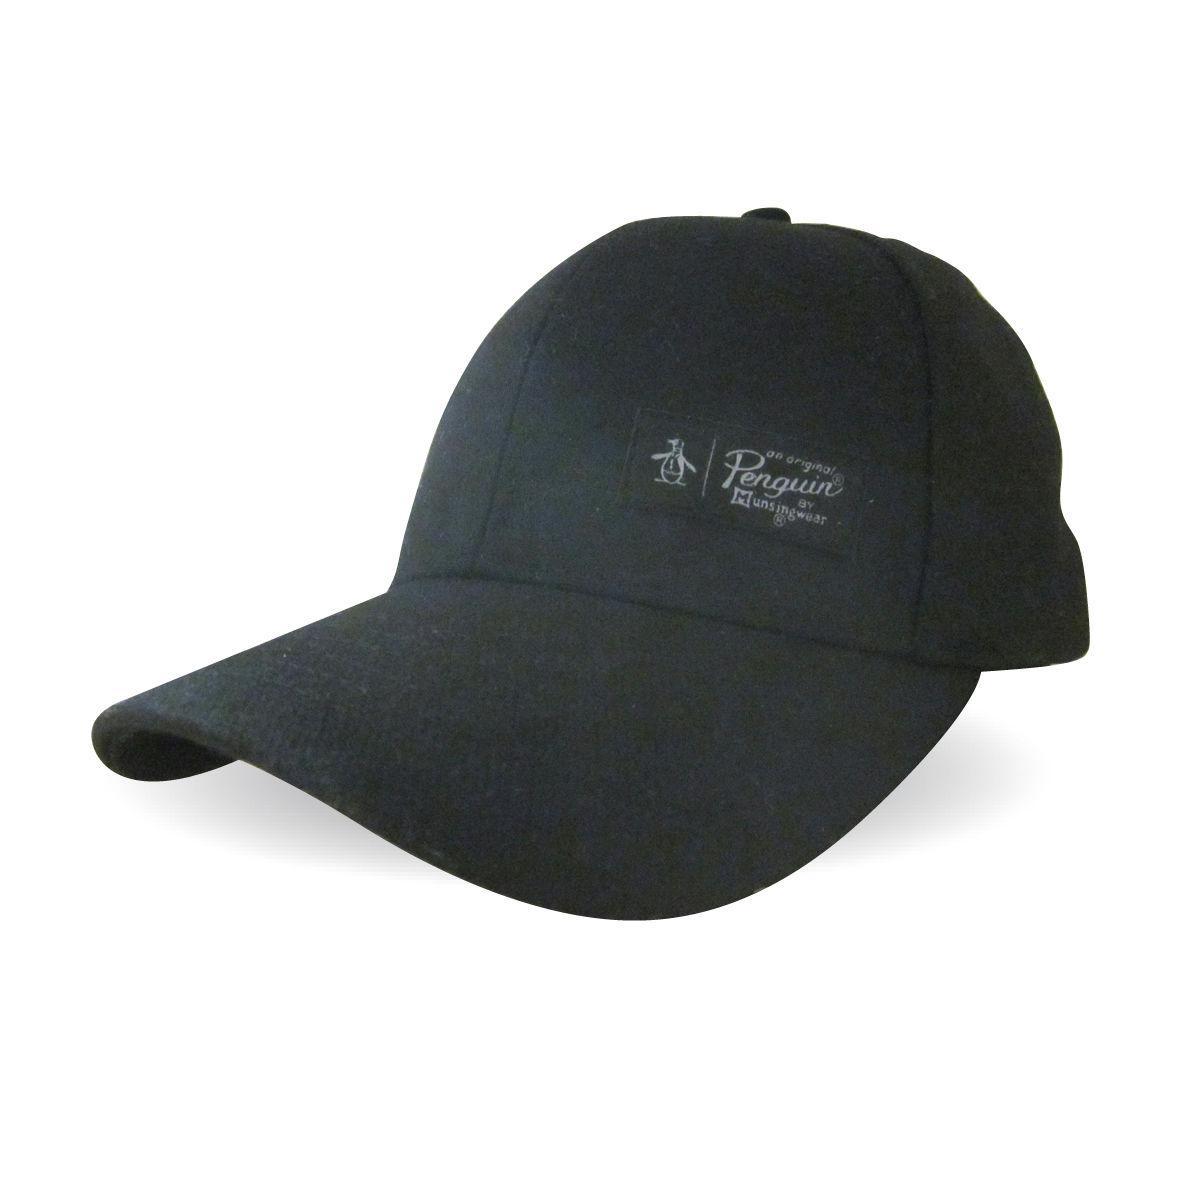 Original Penguin Melton Wool Cap in Black for Men - Lyst 0eb3f6d83f81